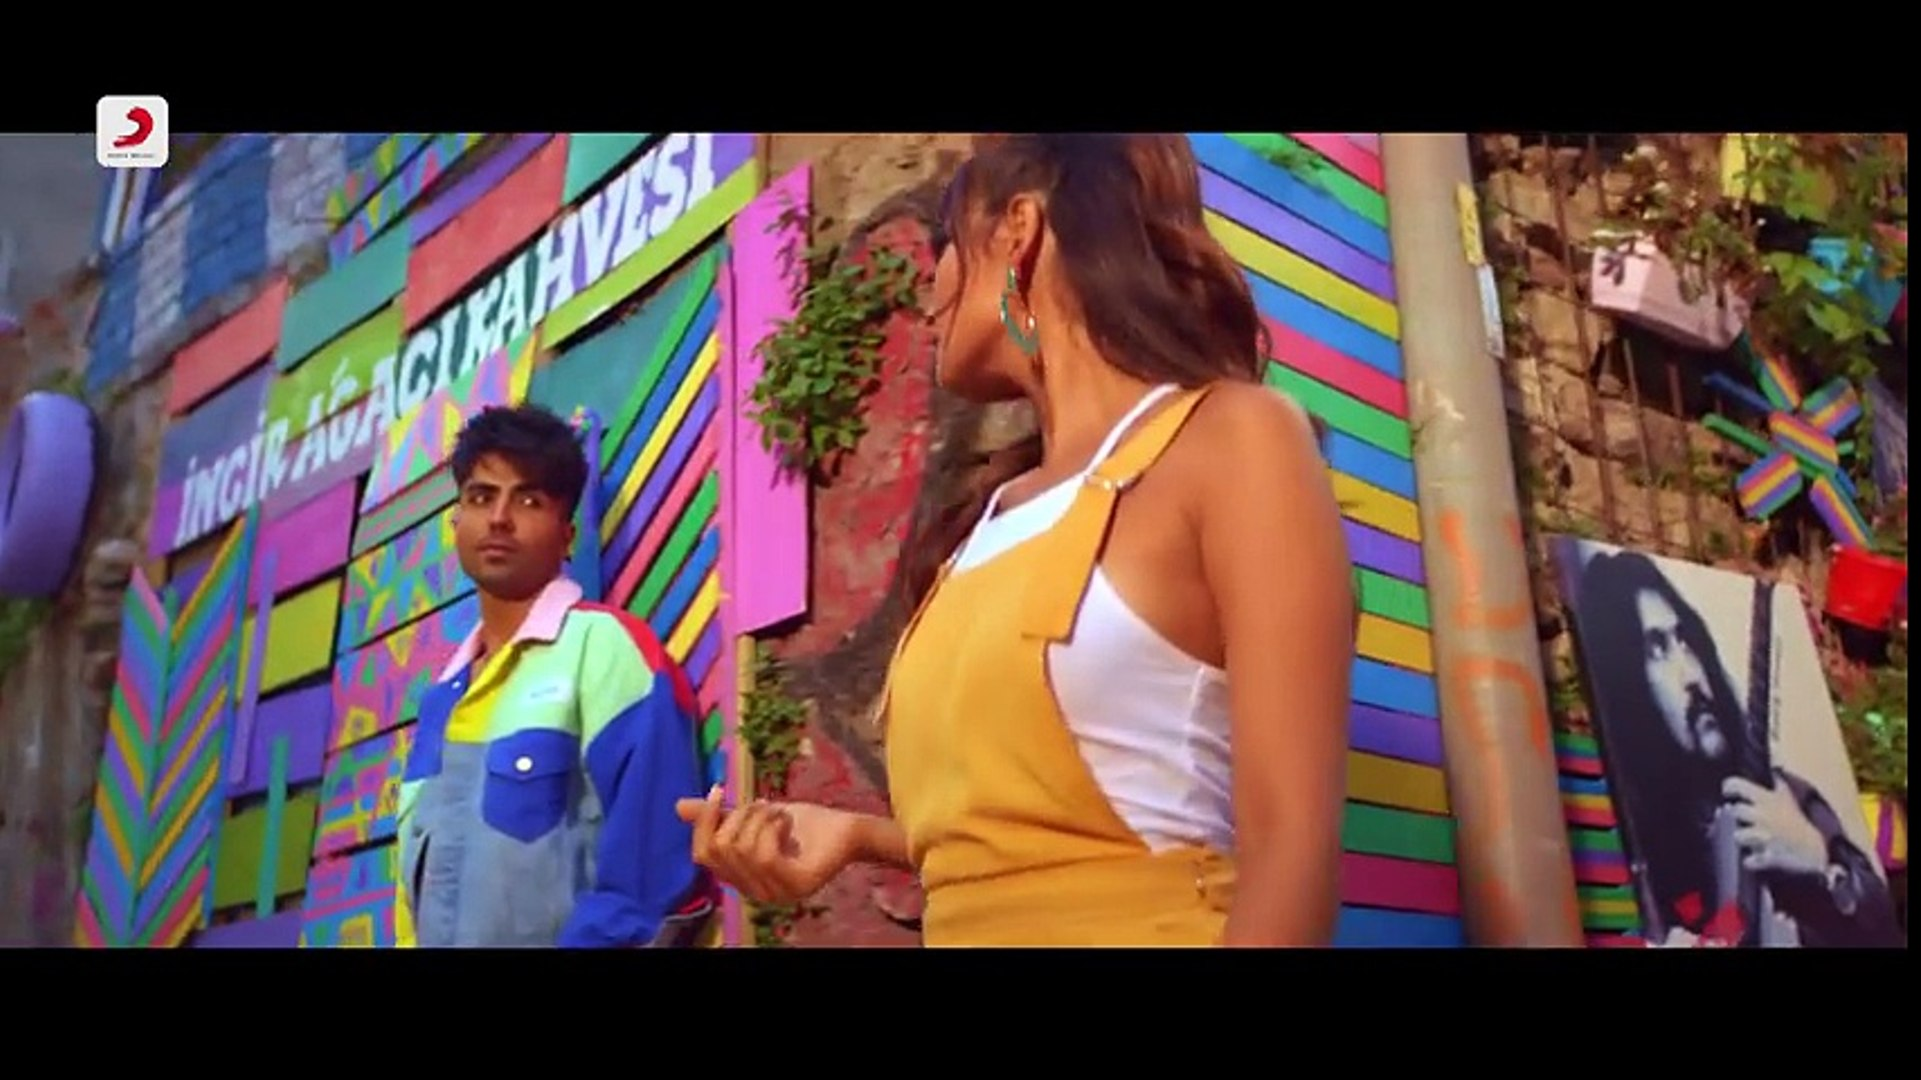 Harrdy_Sandhu_-_Kya_Baat_Ay_|_Jaani_|_B_Praak_|__Arvindr_Khaira_|_Official_Music_Video